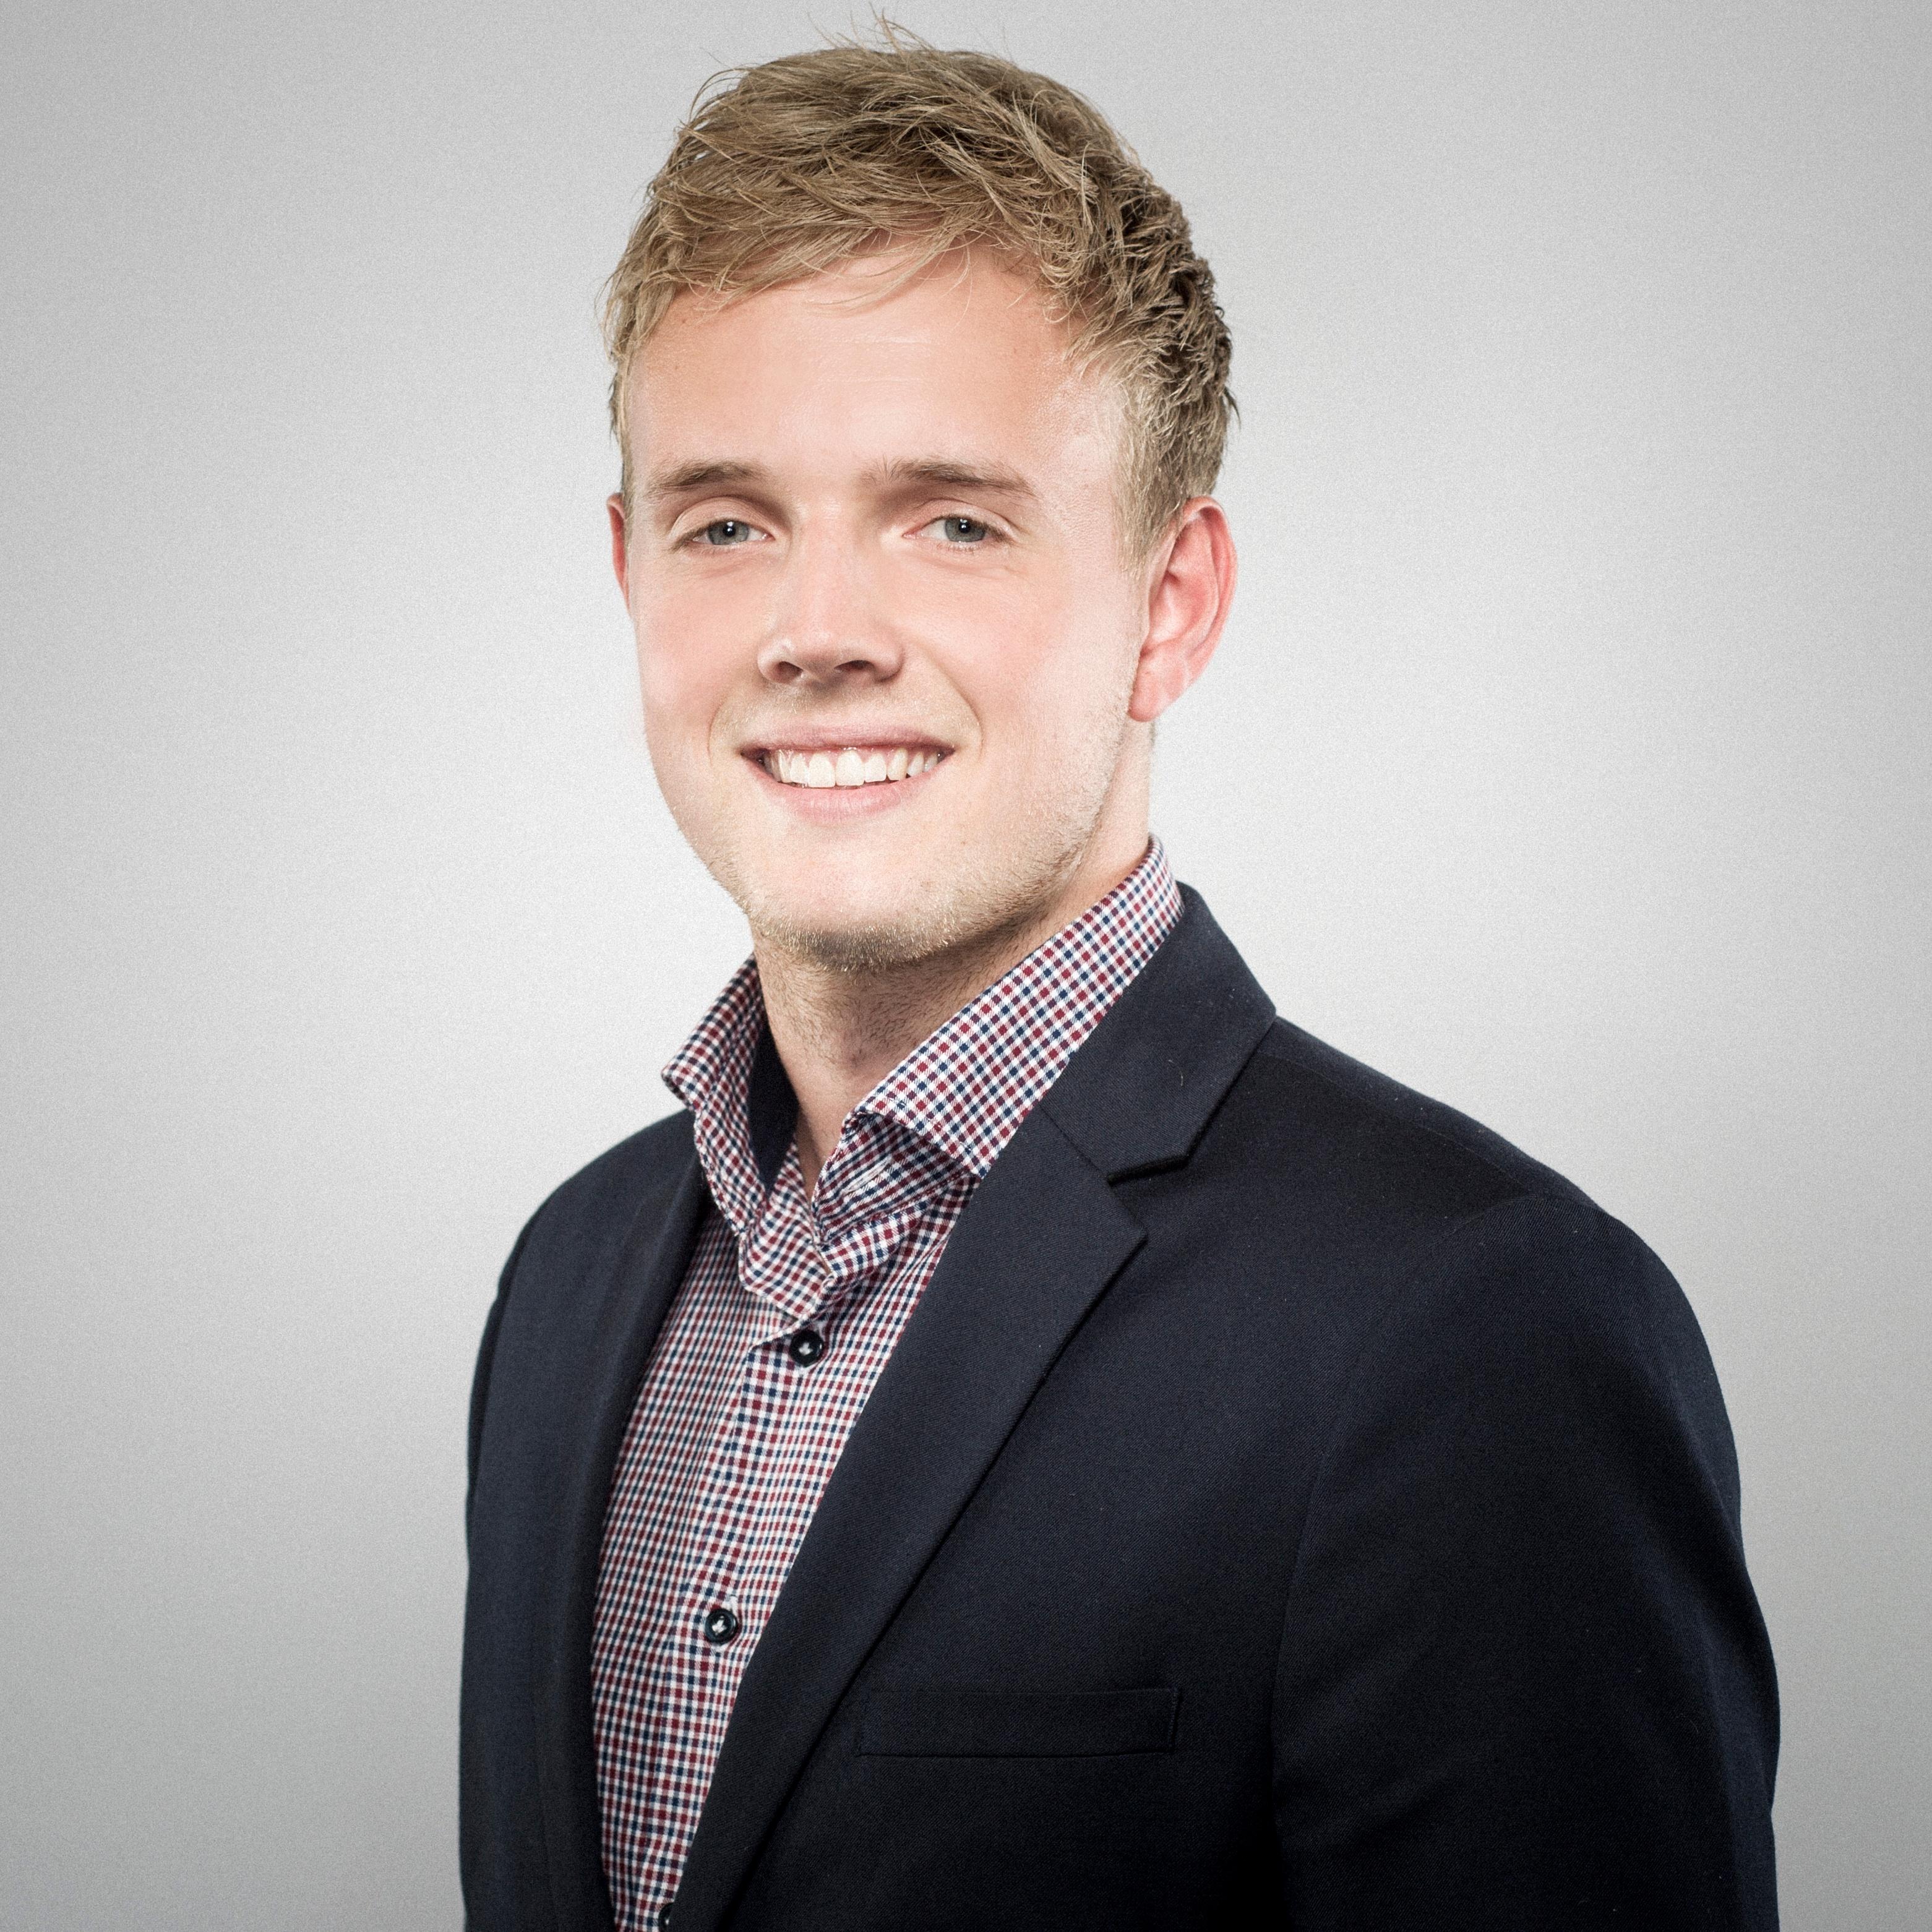 Collin de Boer, Business Development Manager